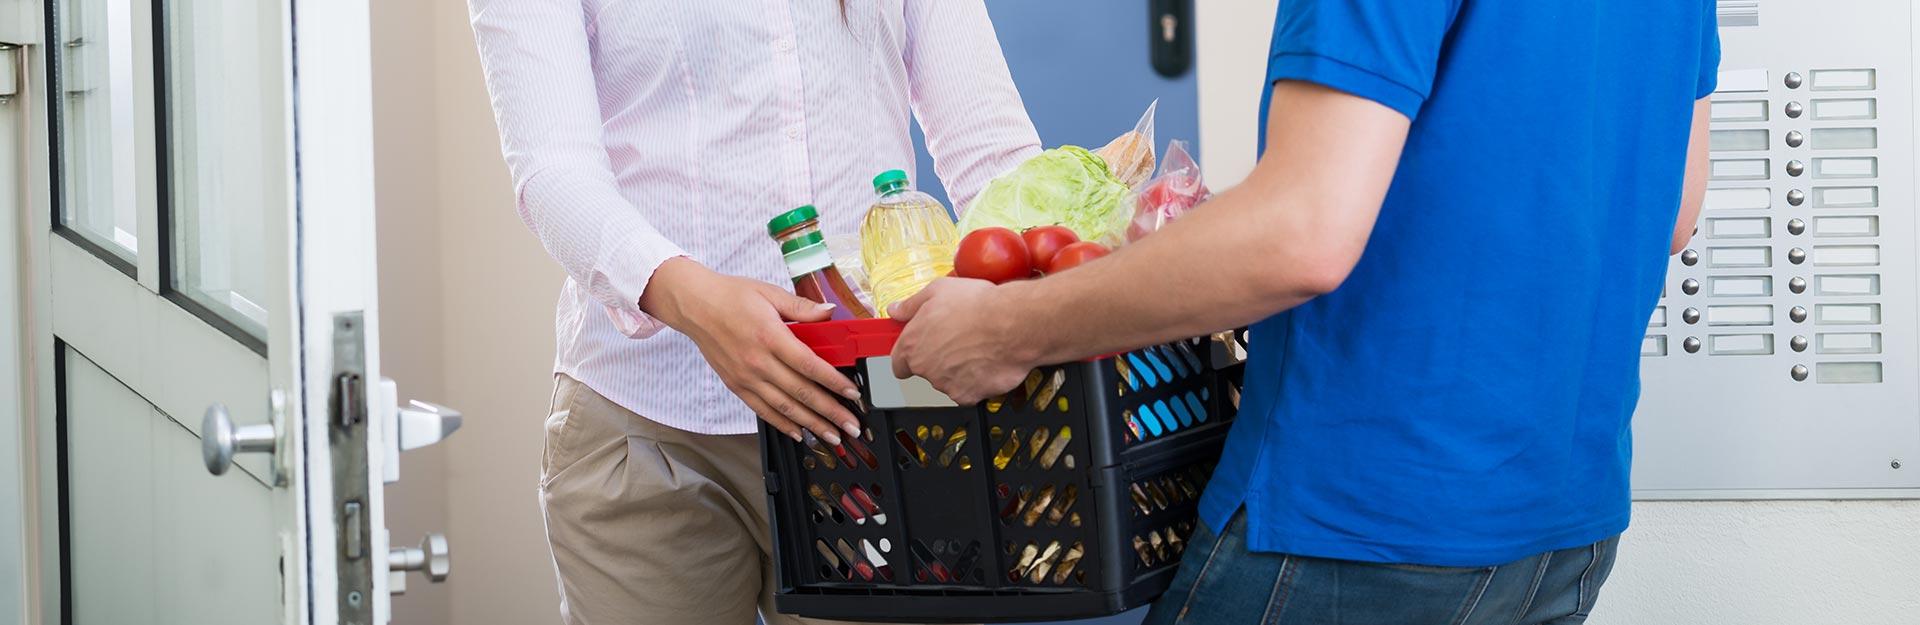 Man handing woman box of groceries